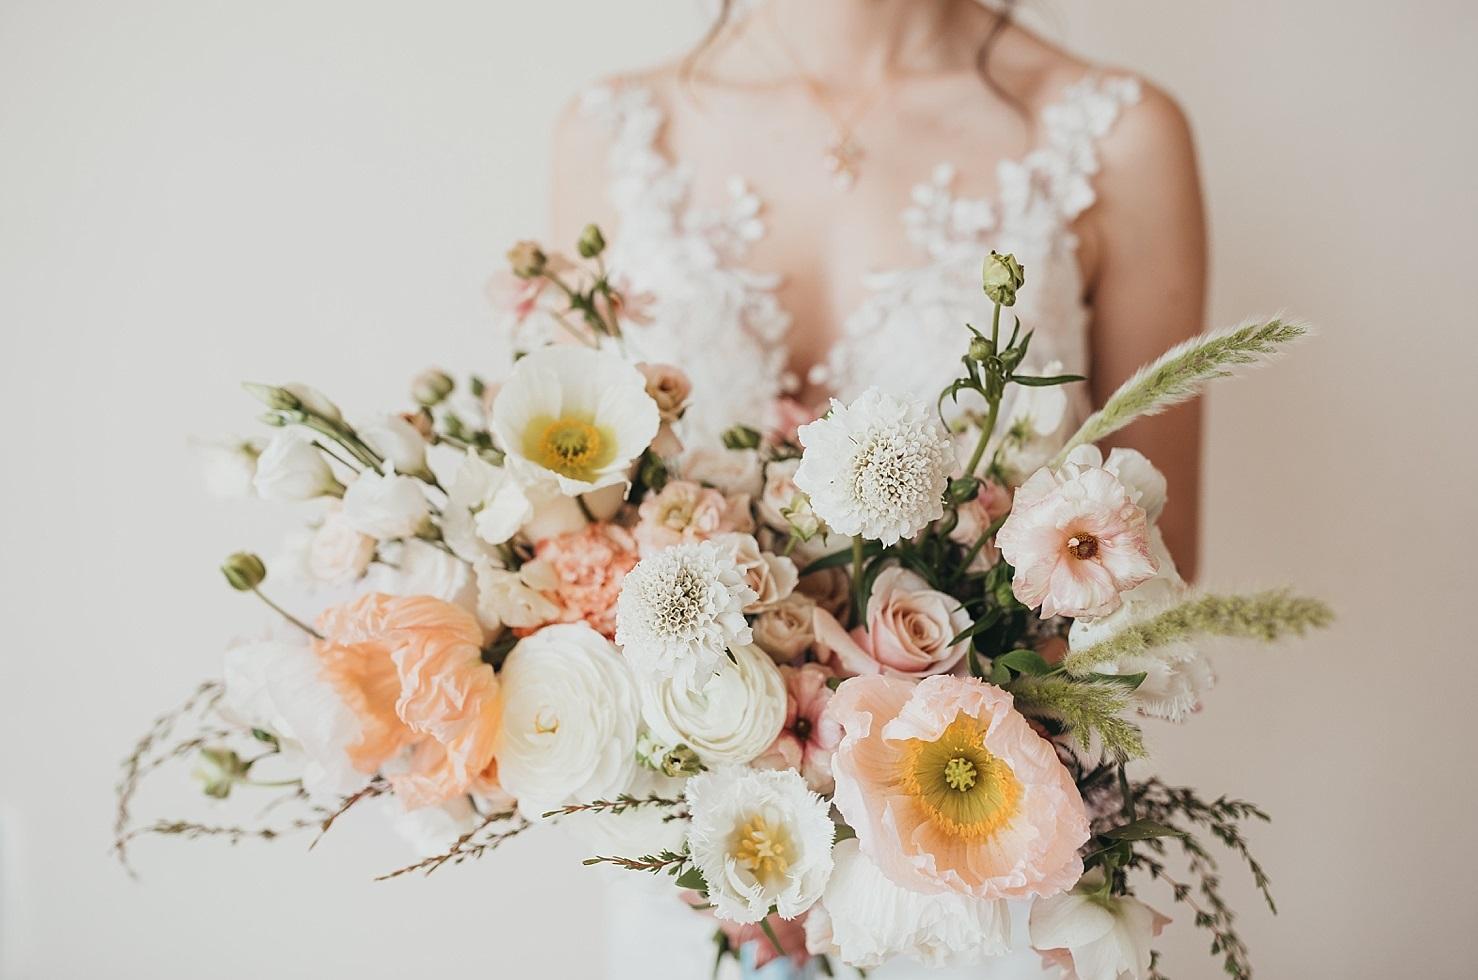 Bruid met wit en roze bruidsboeket